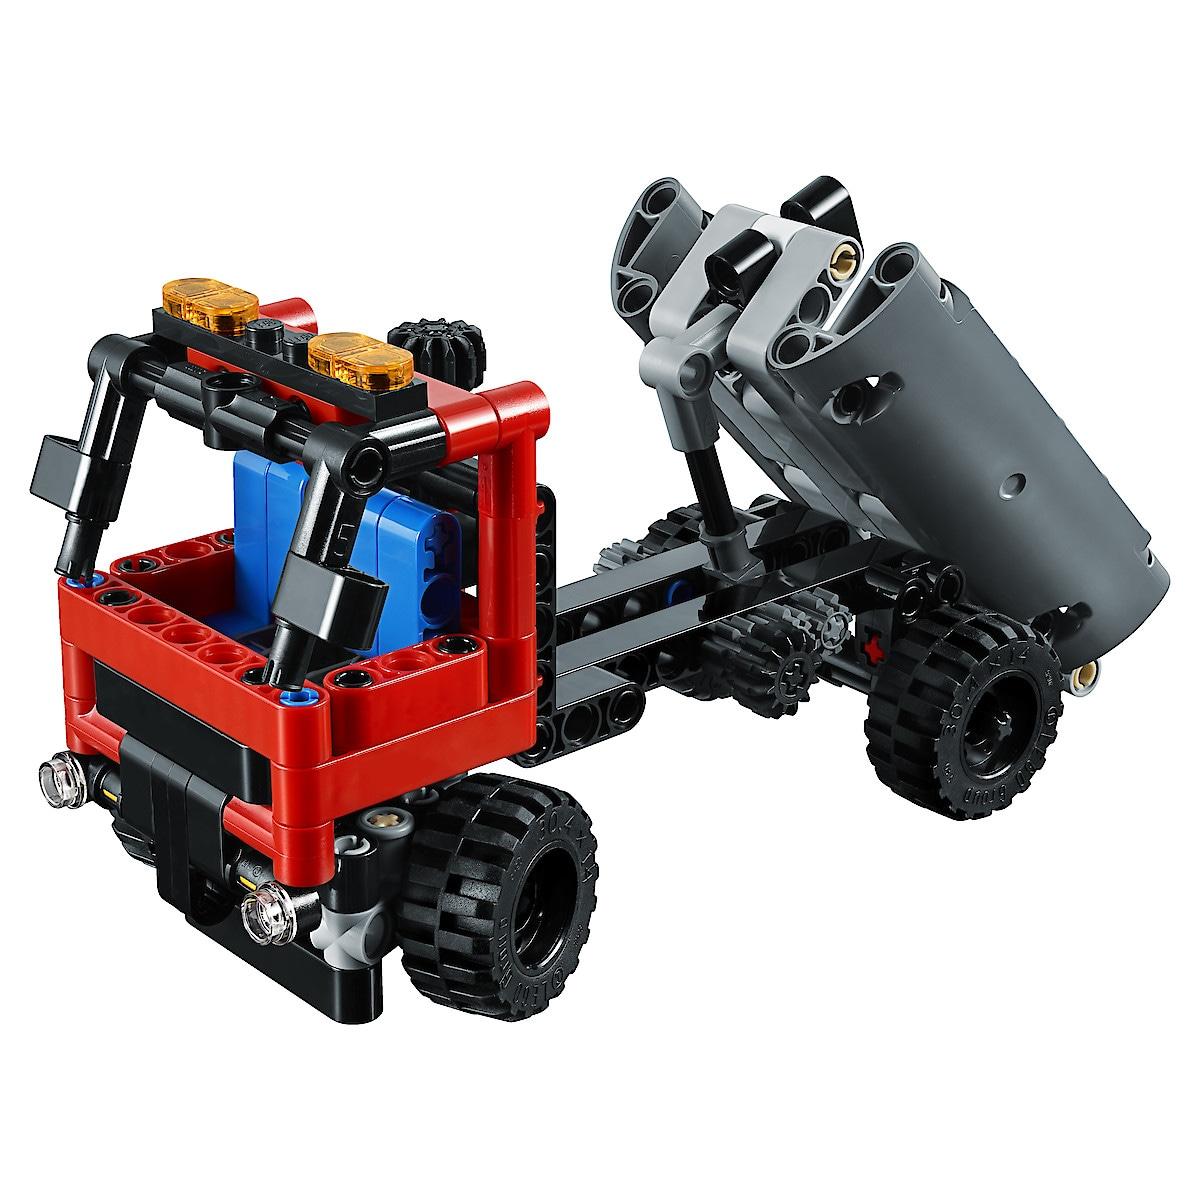 LEGO Technic 42084, Kroklaster